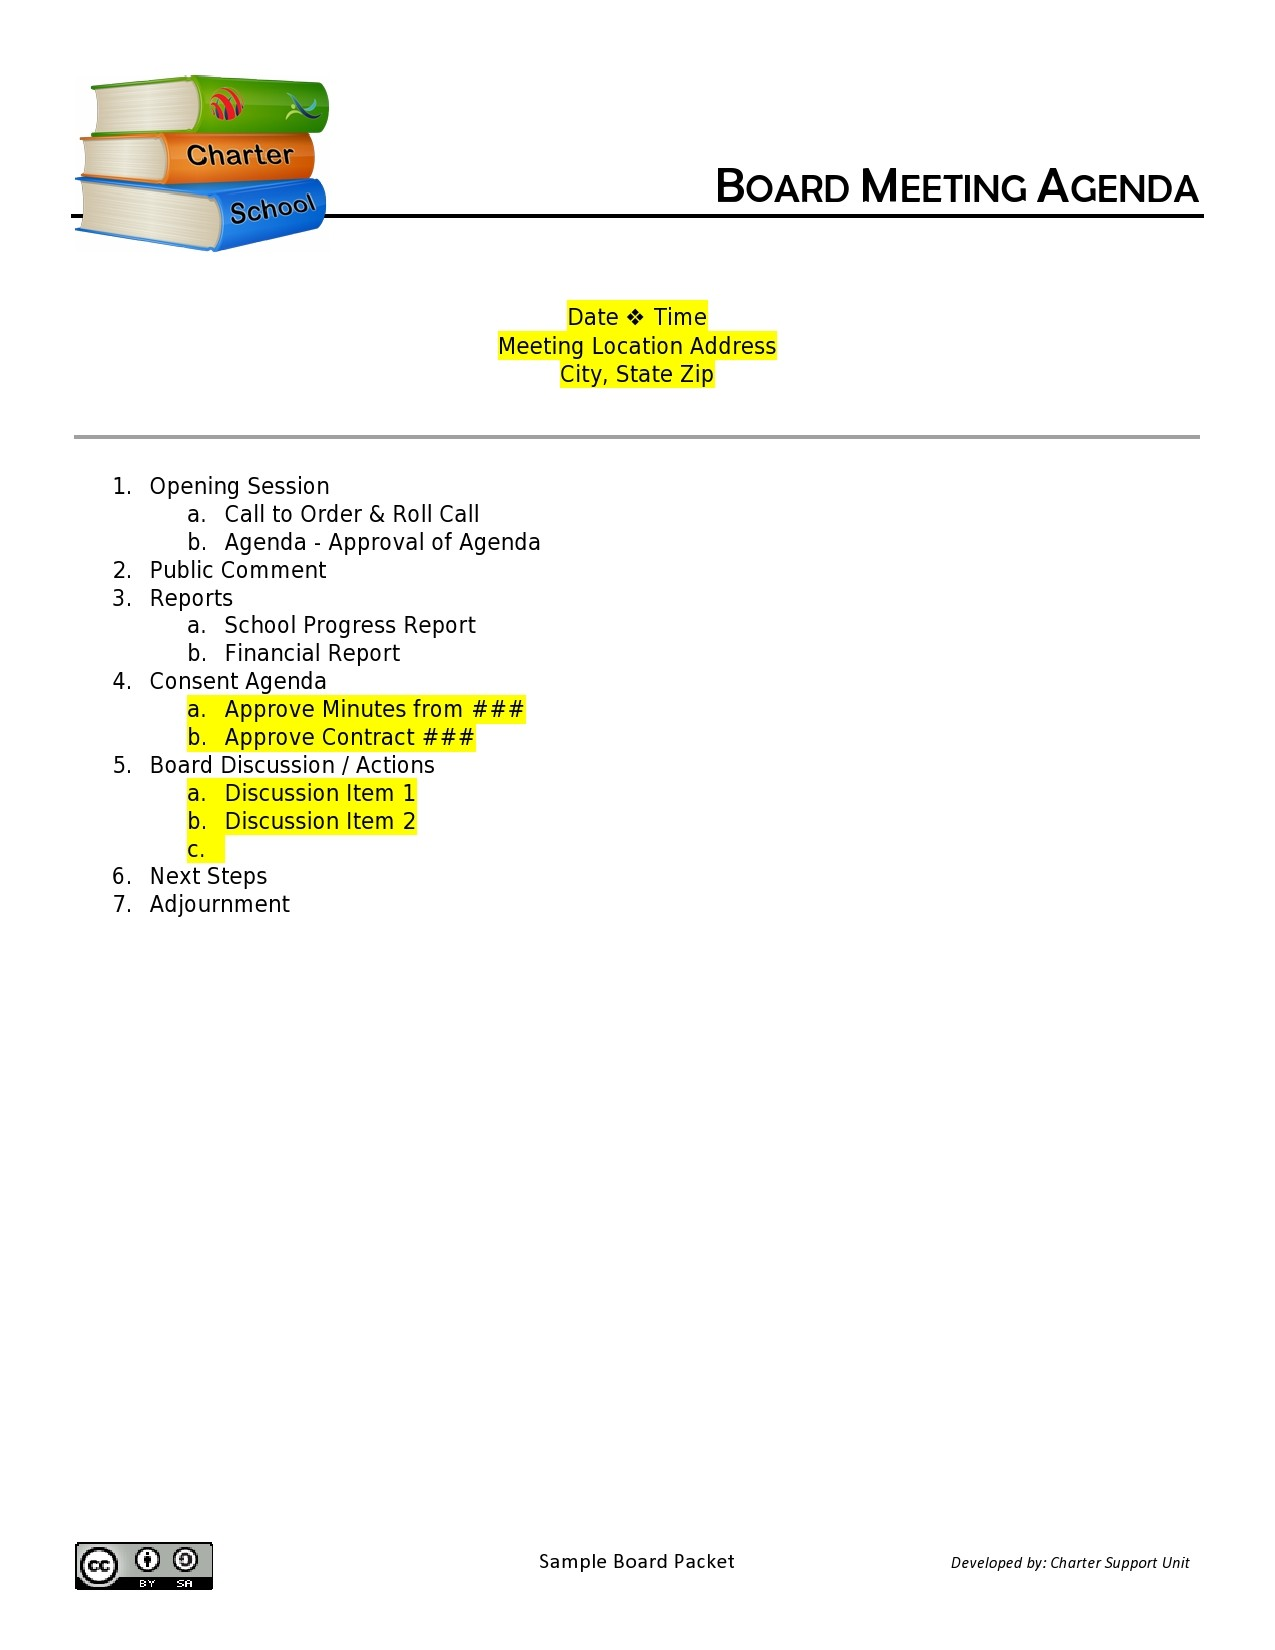 Free board meeting agenda 35